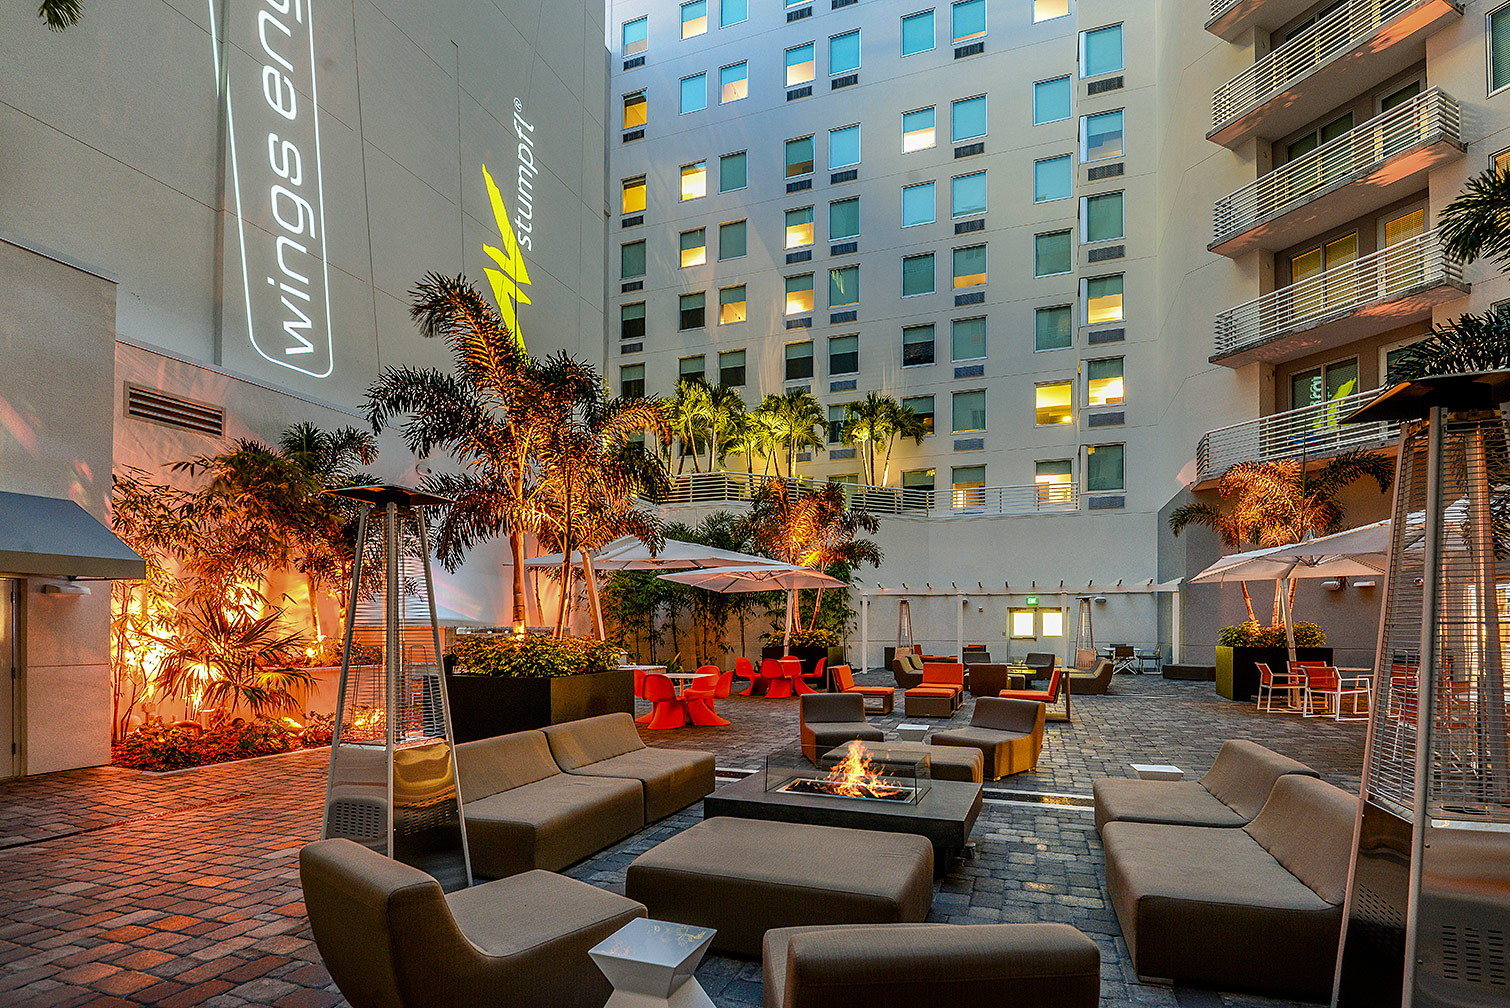 Aloft Hotel Courtyard at Night